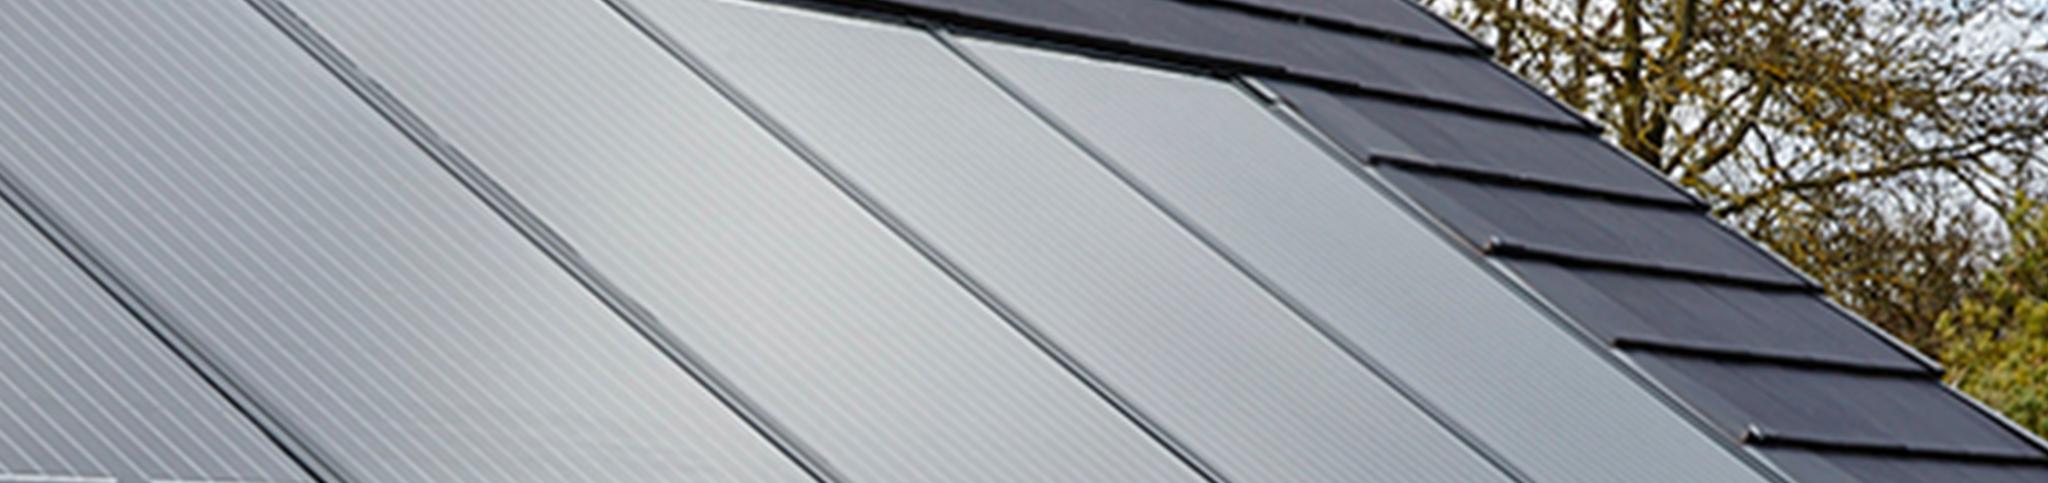 Zonnepanelen Roozenburg dakwerken